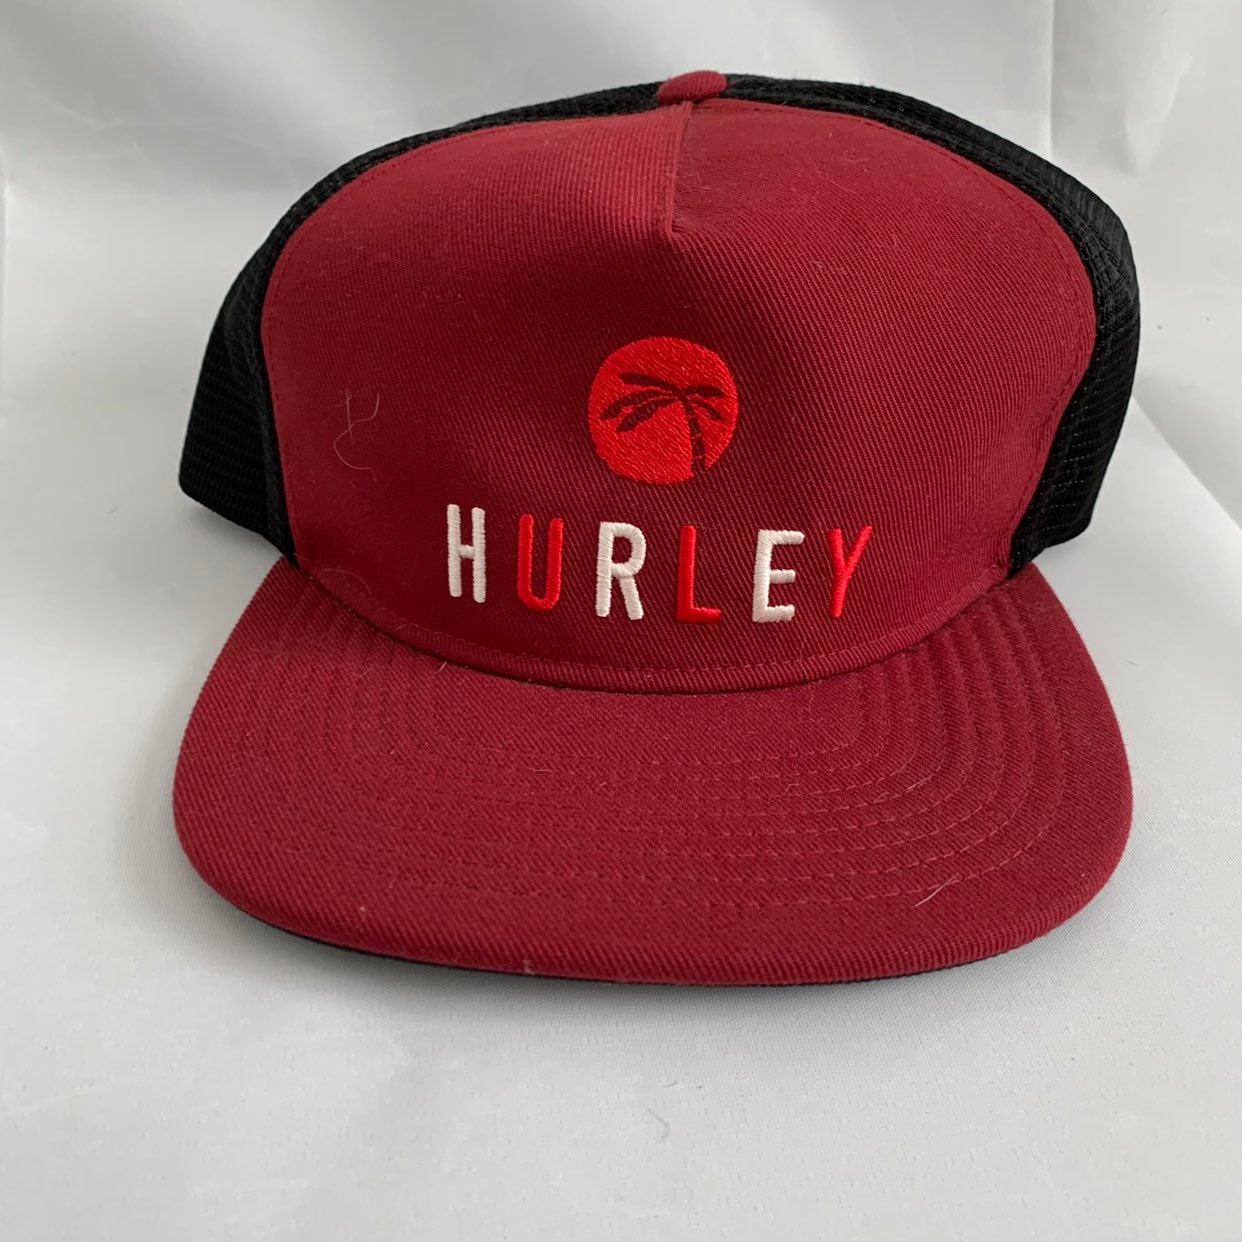 Hurley Mesh Back Hat